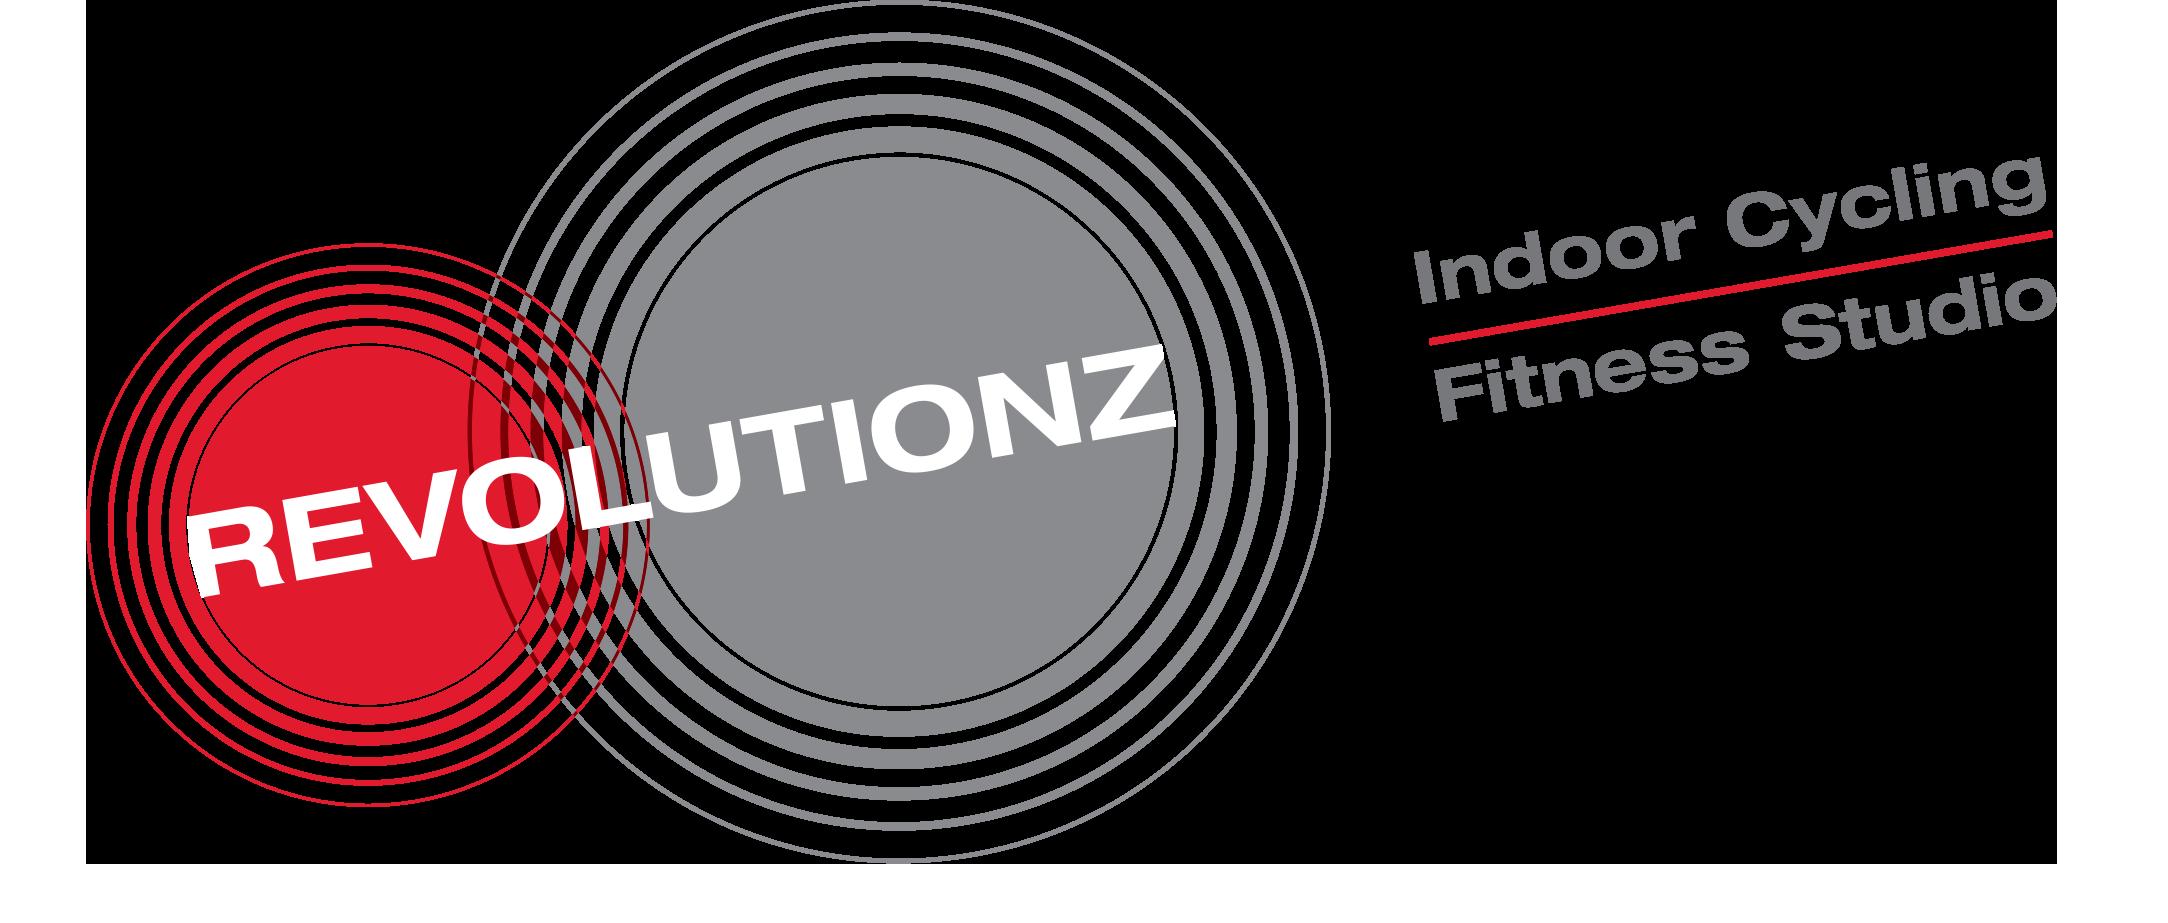 Revolutionz logo_cropped.png